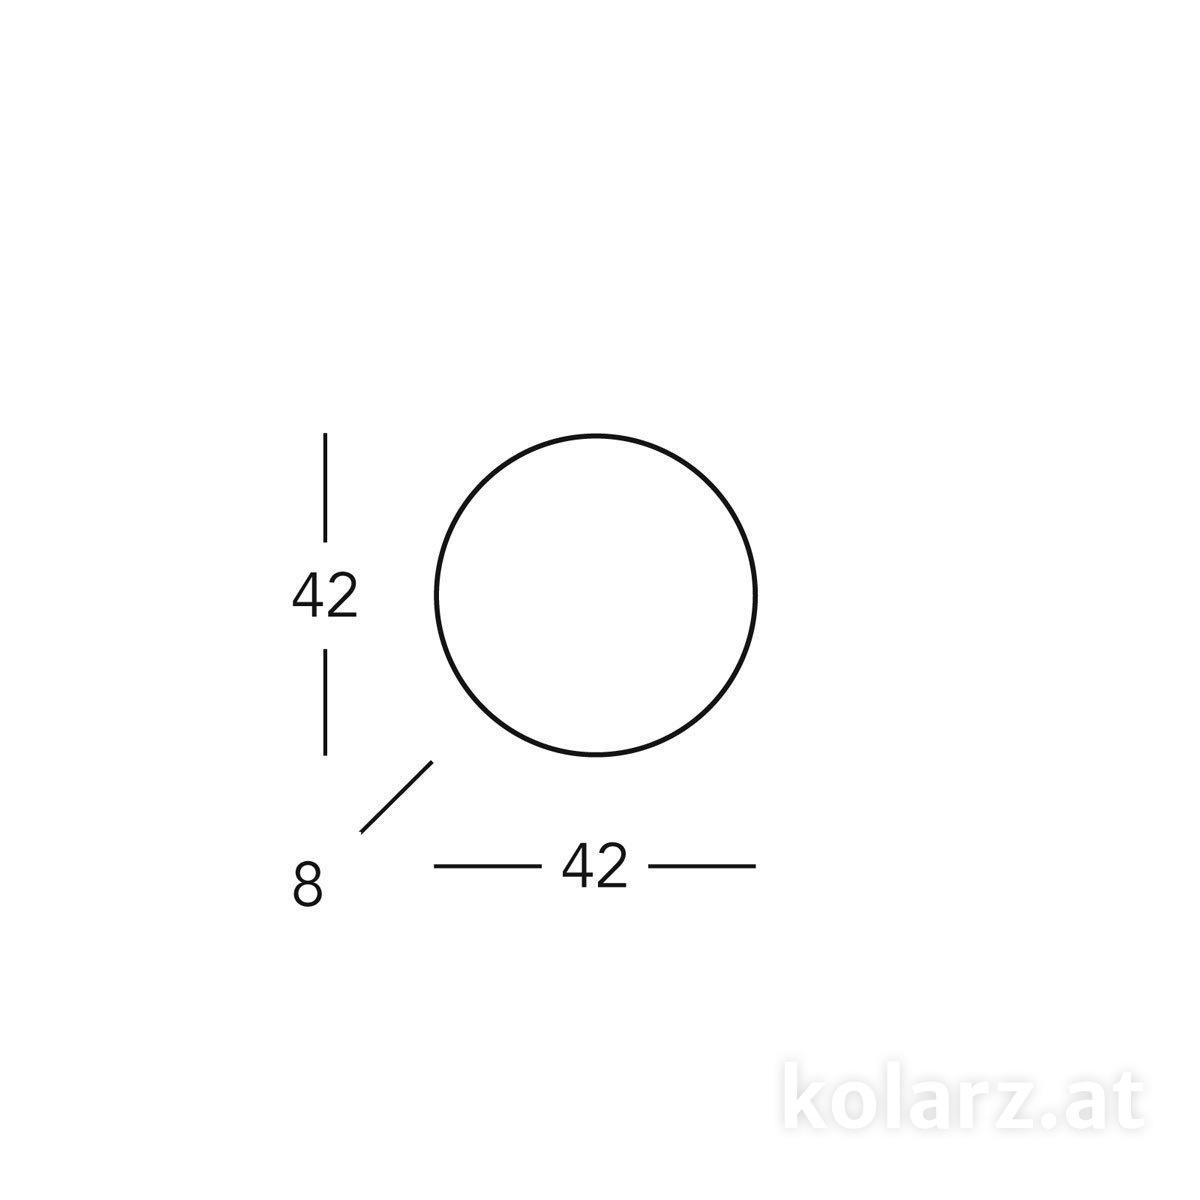 0296-U13-6-WBk-s1.jpg